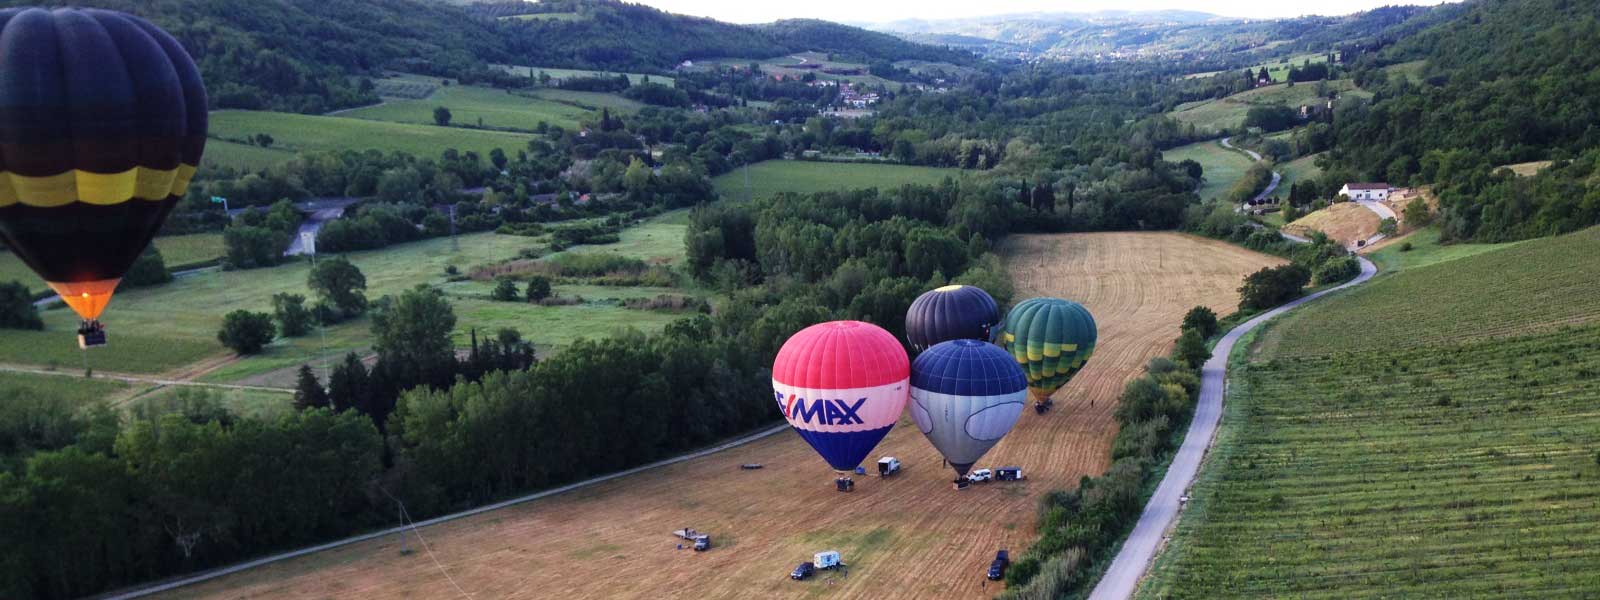 balloon-group-takeoff-italy